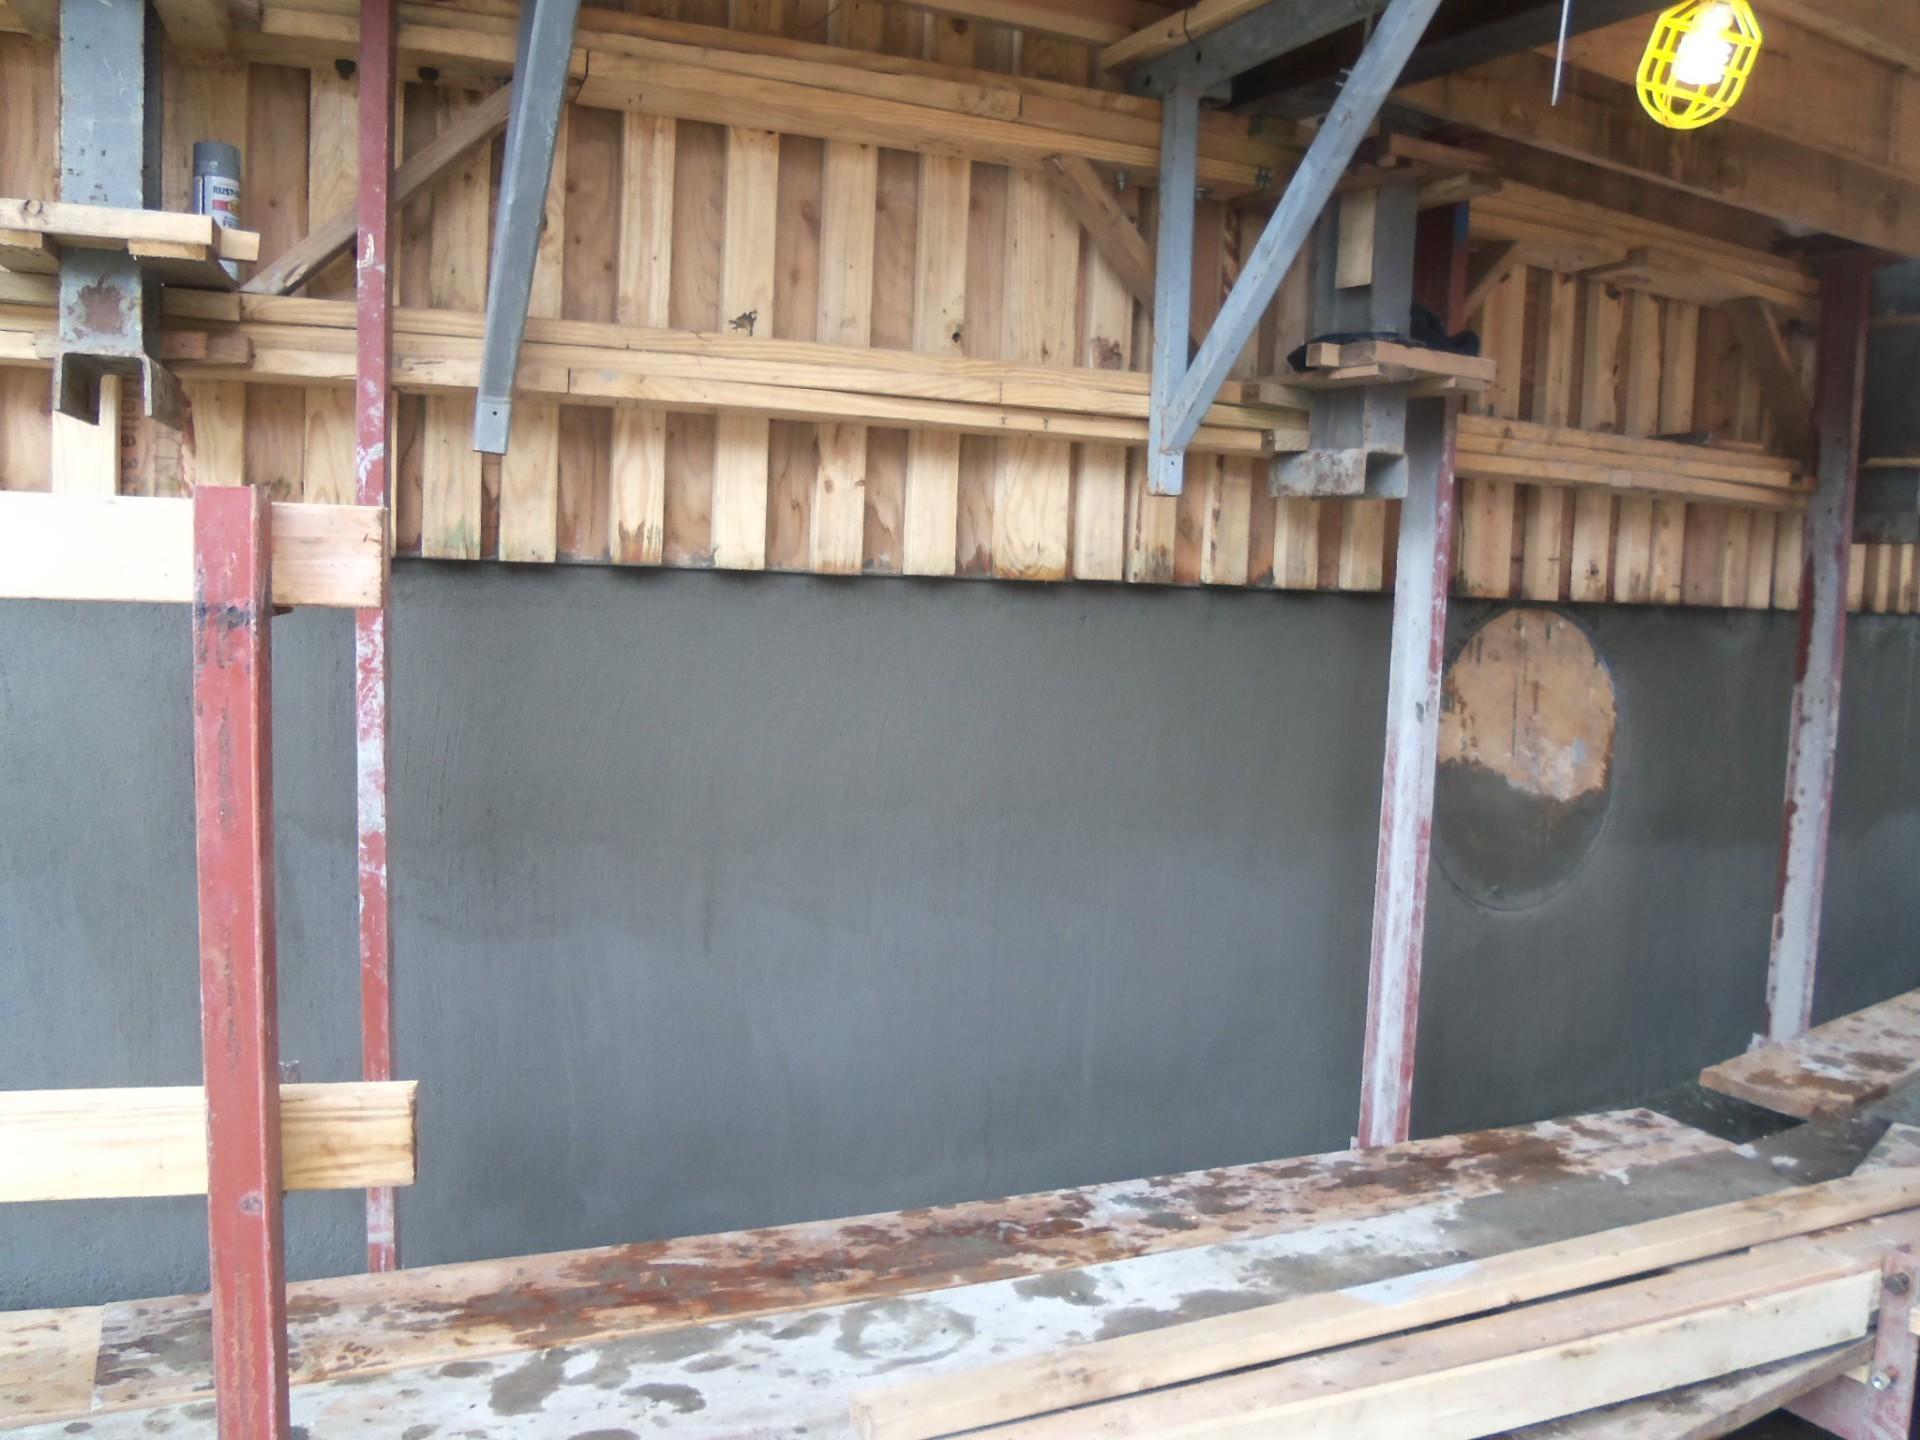 Bangert Construction Services